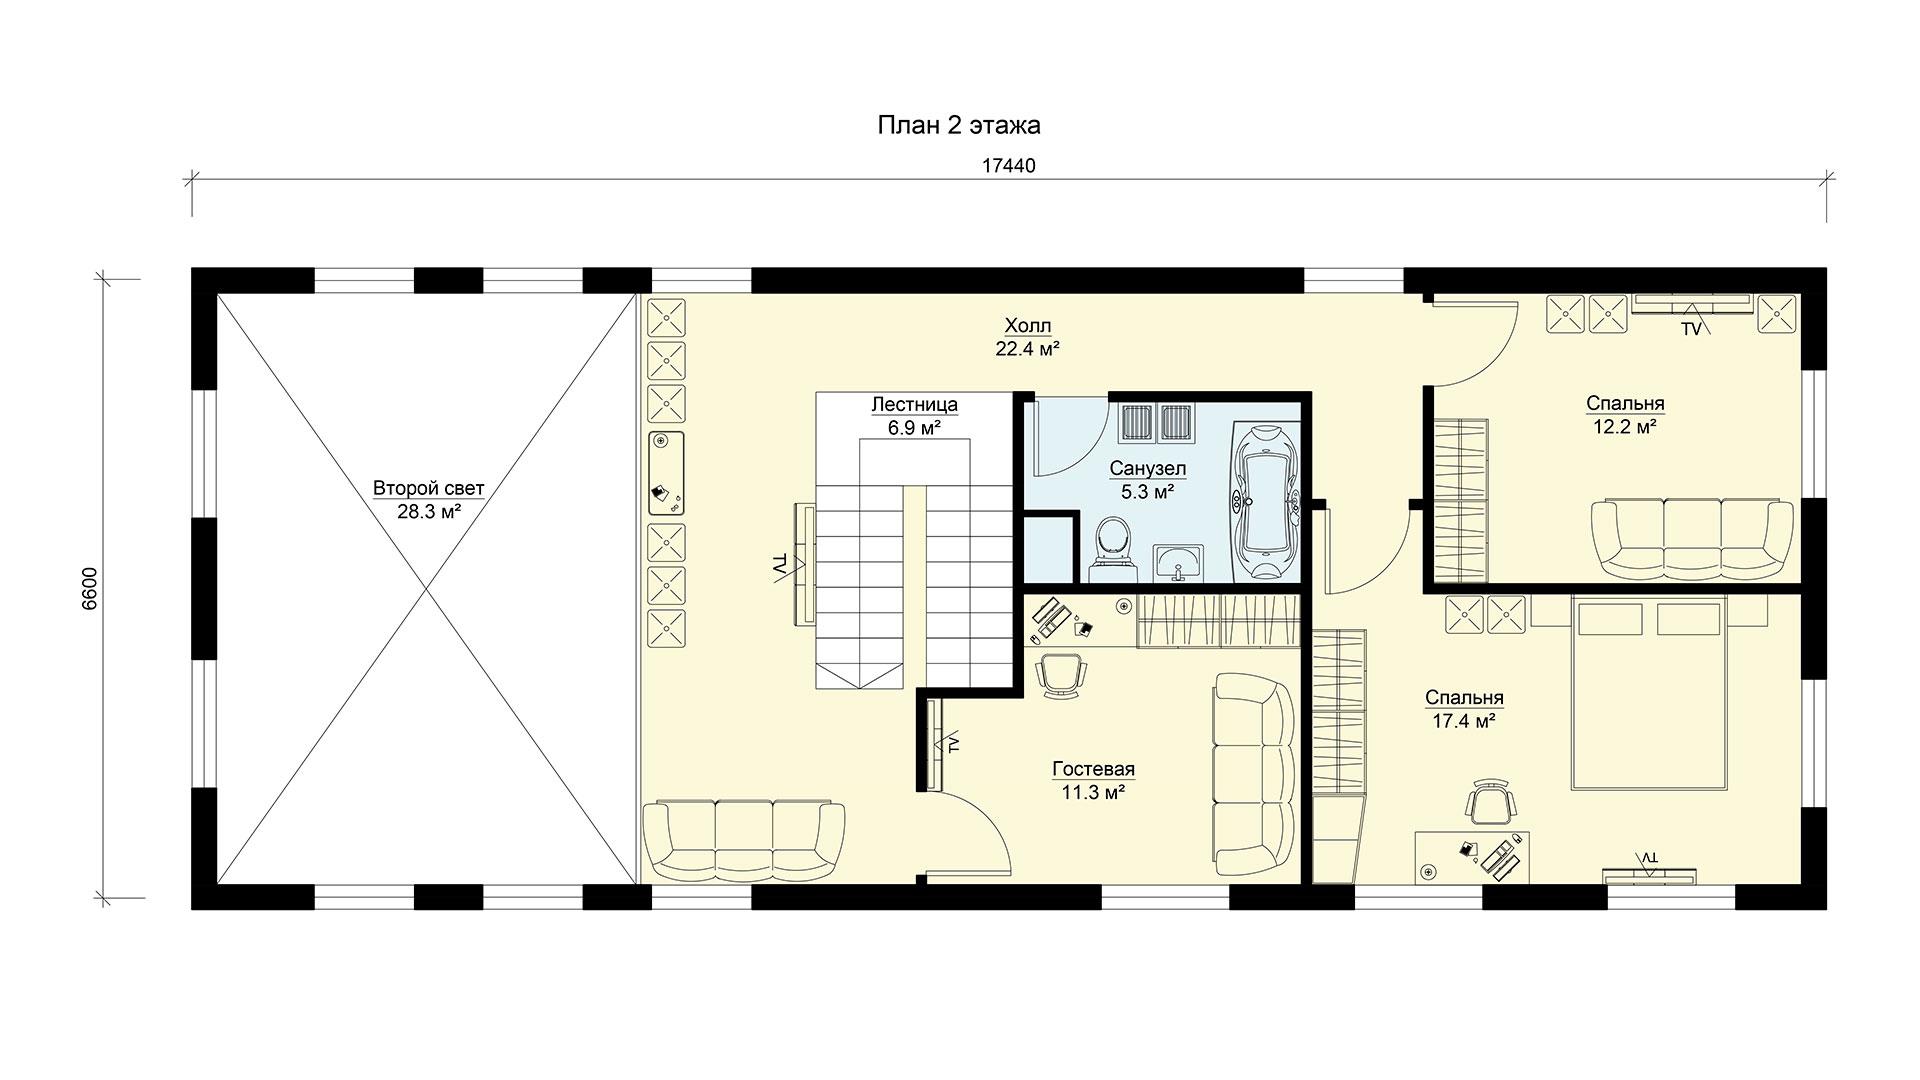 План второго этажа двухэтажного дома БЭНПАН, проект МС-200.